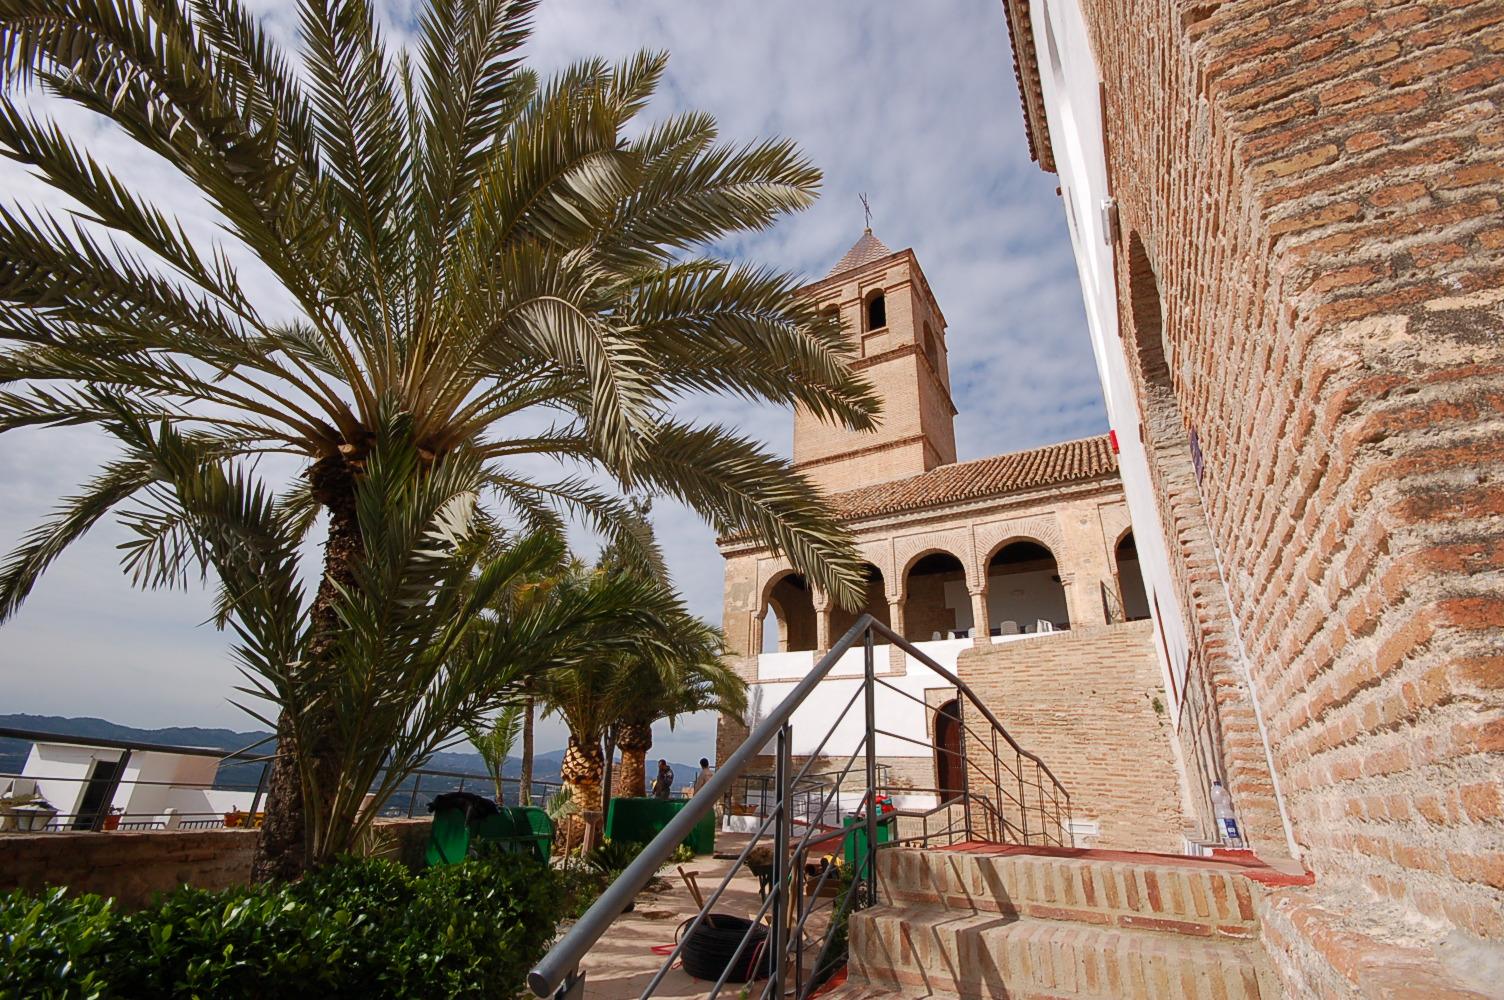 Museo de la Semana Santa de Vélez-Málaga